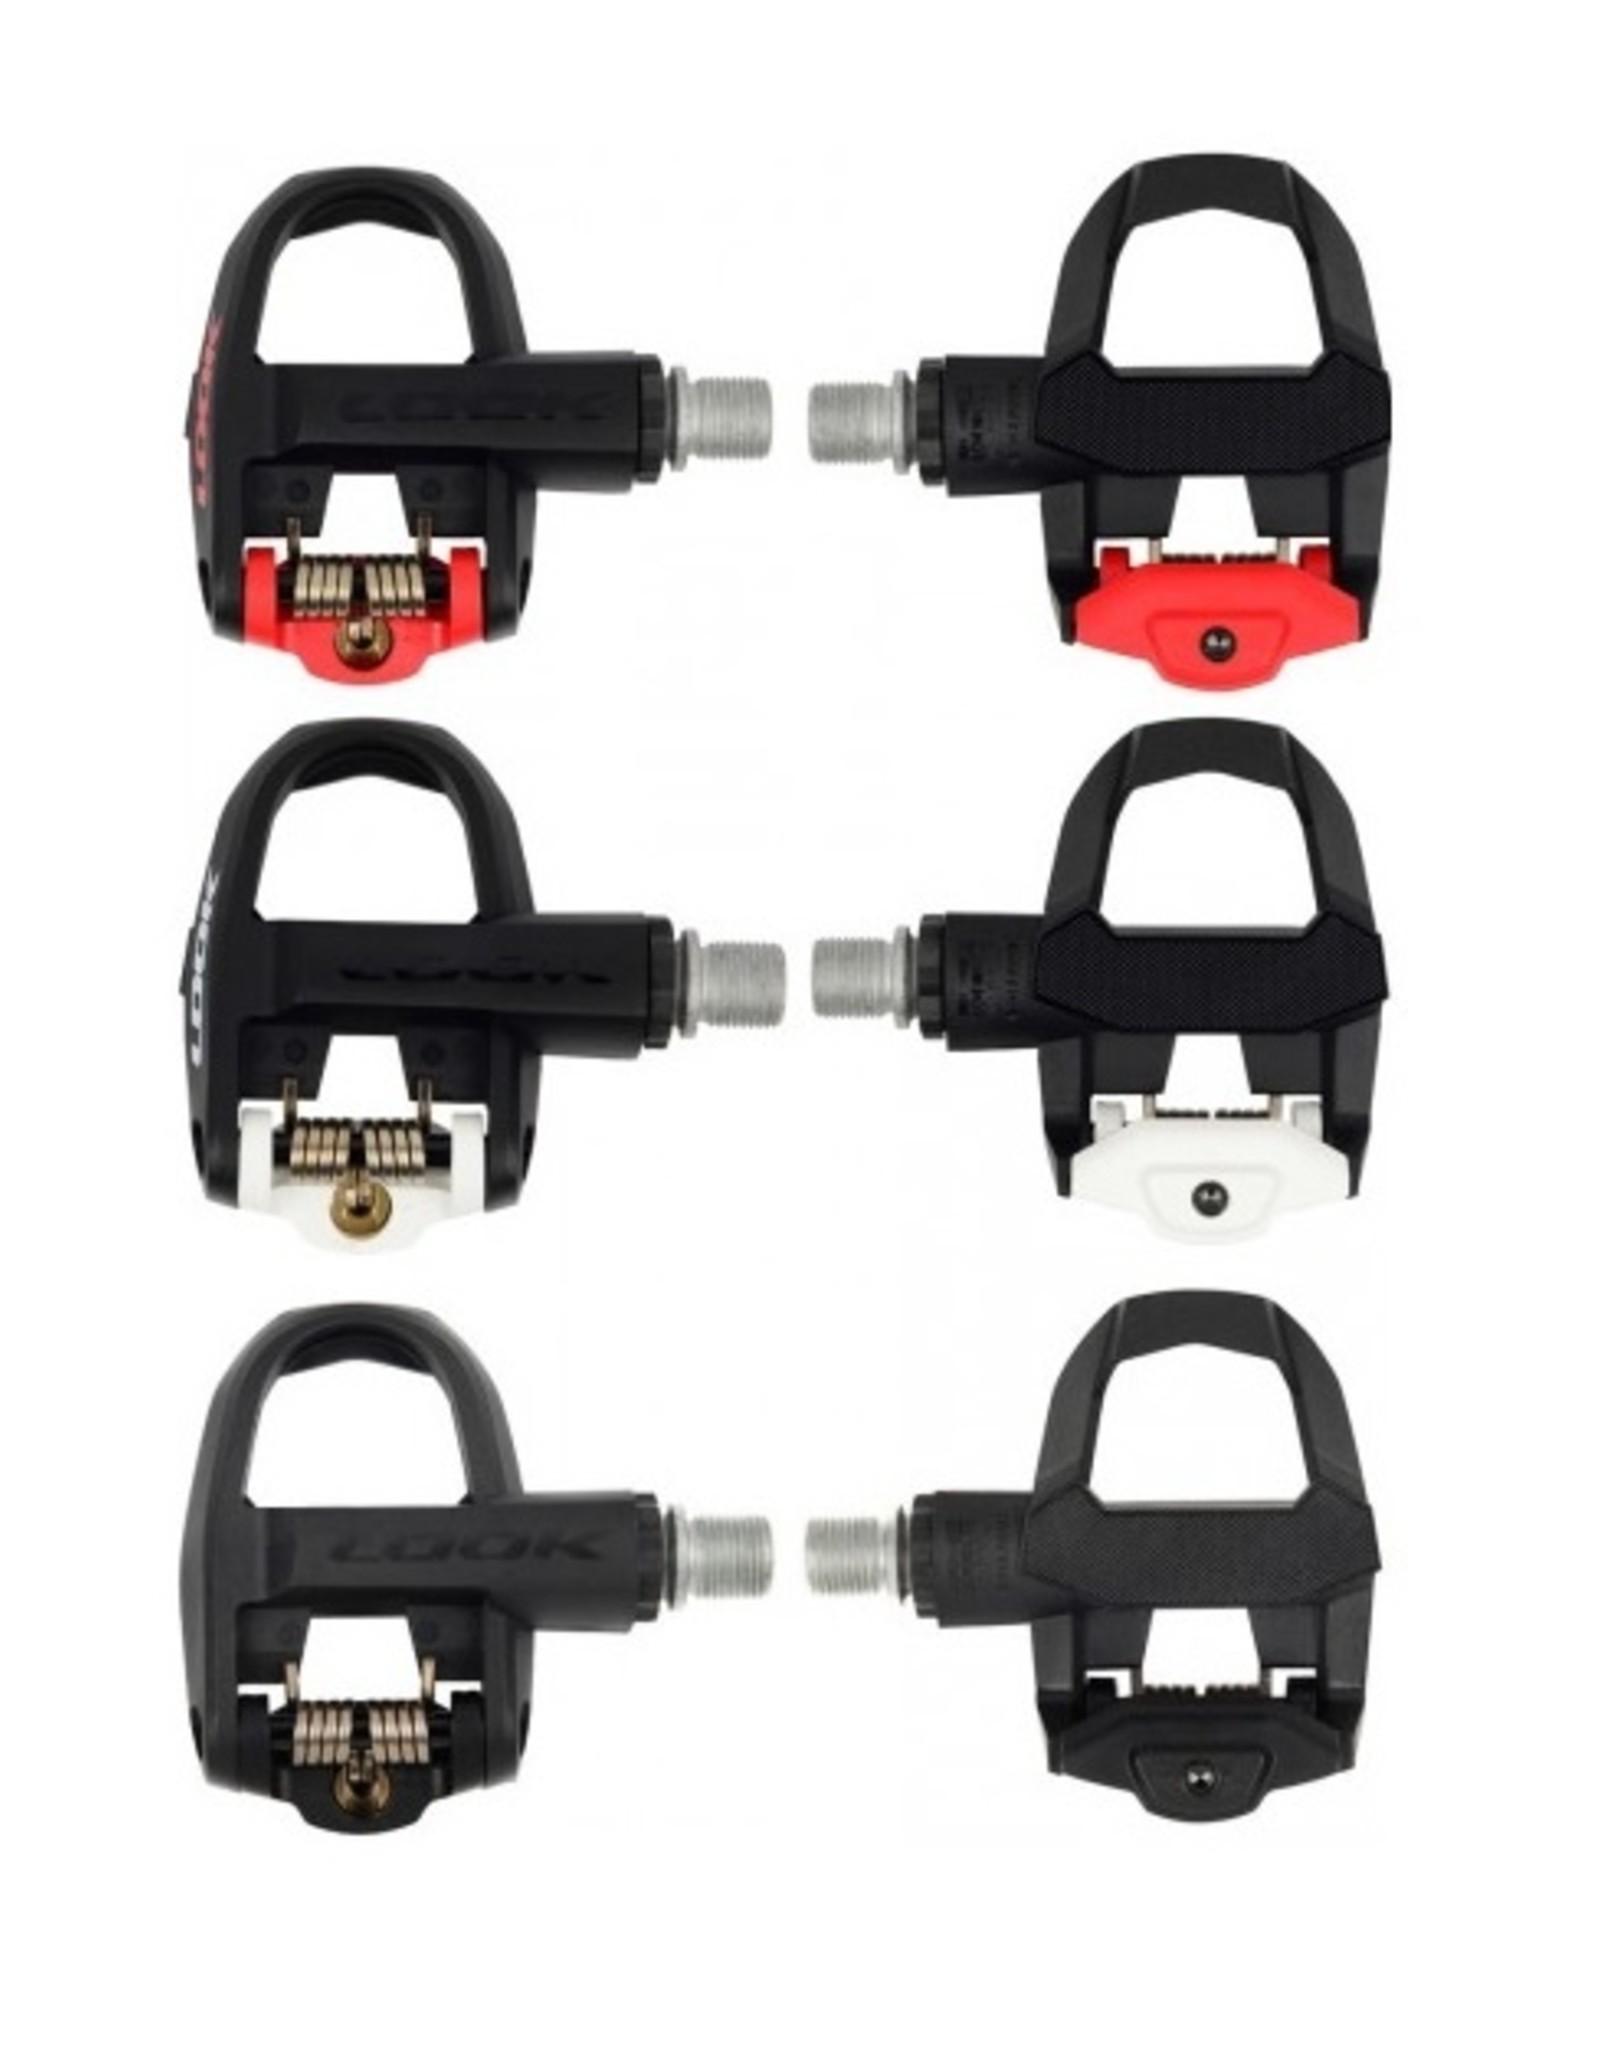 Pedals - Look Keo Classic 3